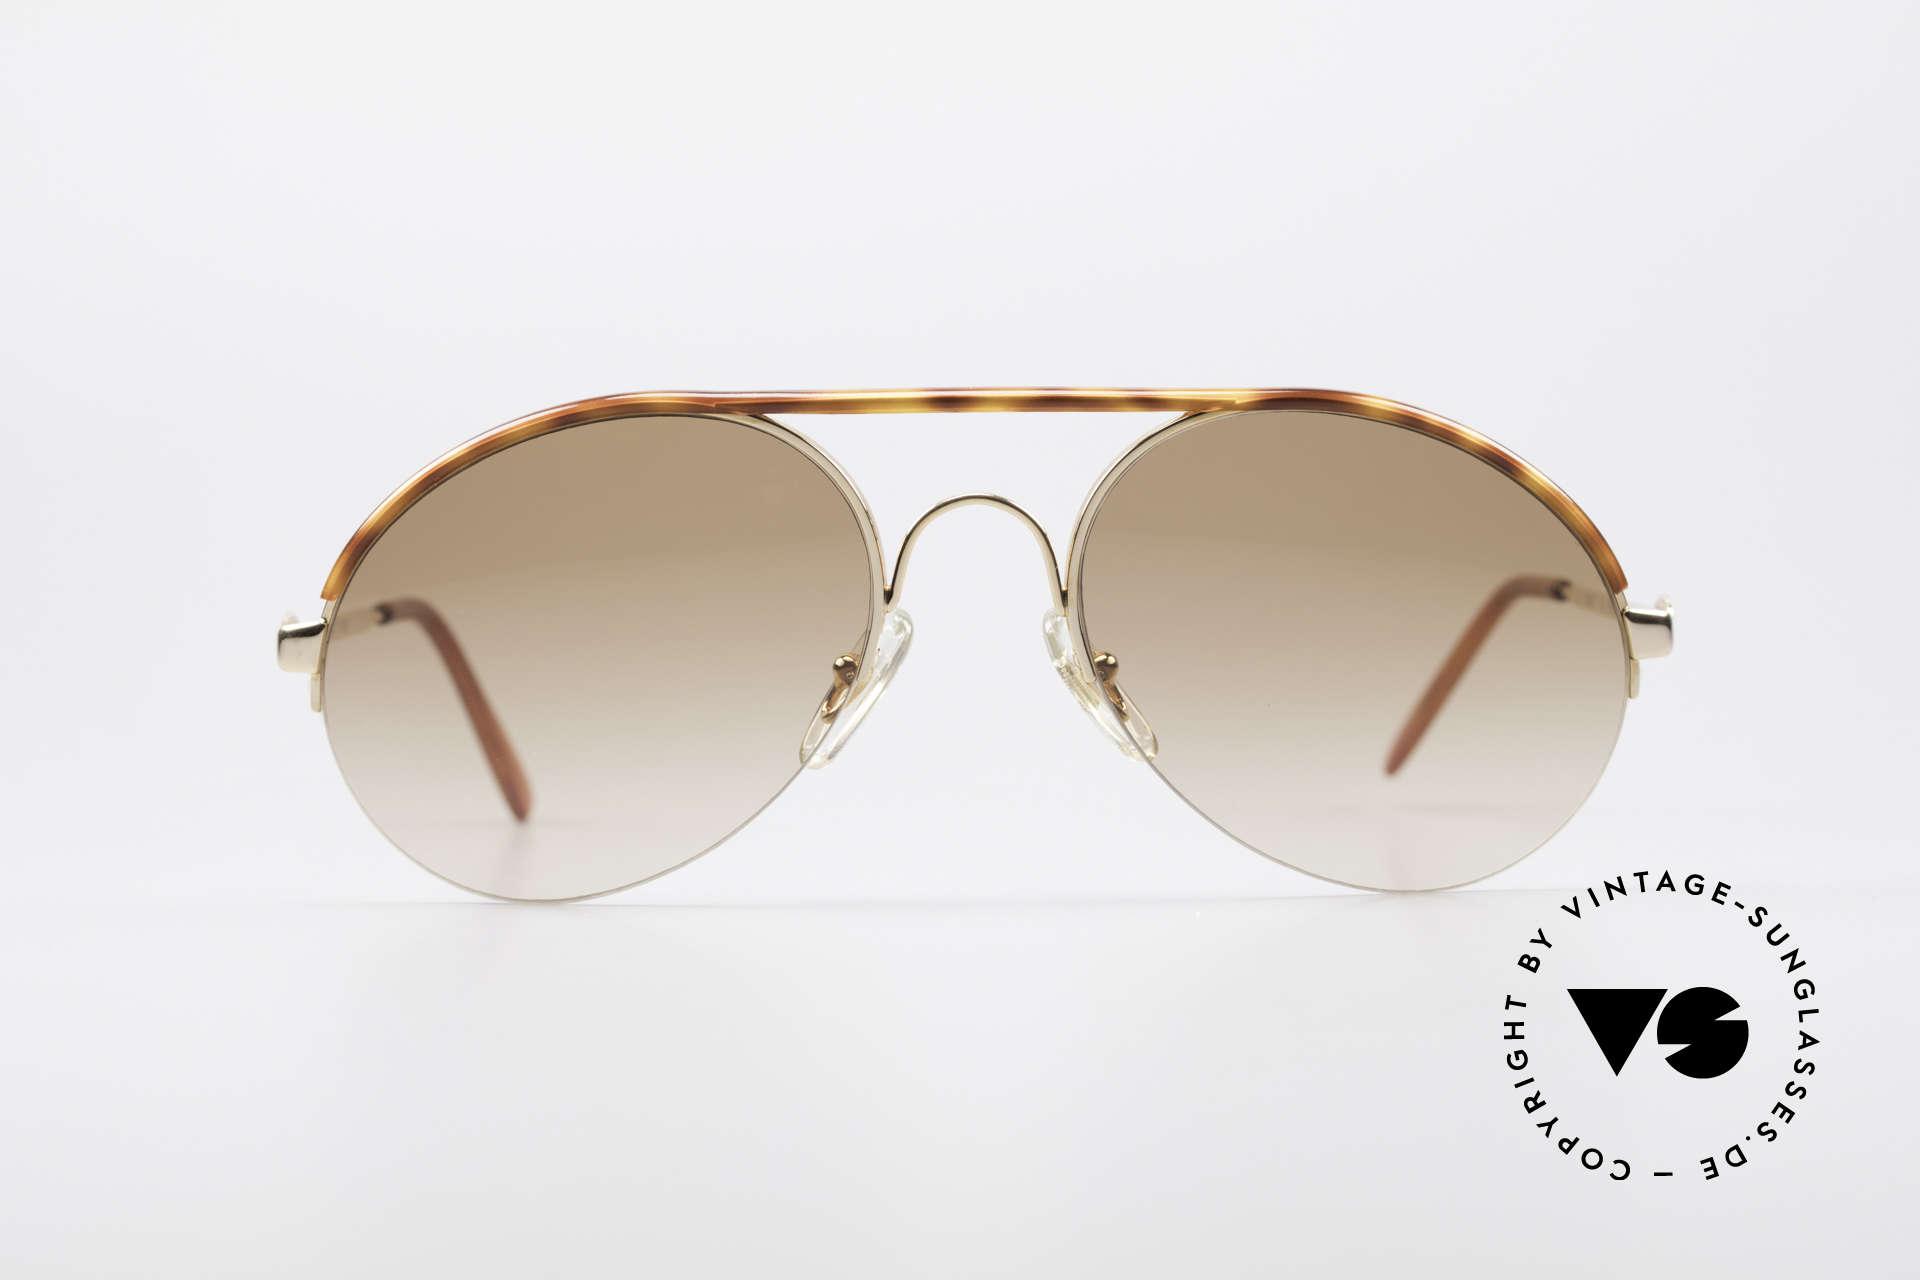 Bugatti 64919 90's Semi Rimless Sunglasses, crafted around 1990 in France (top craftsmanship), Made for Men